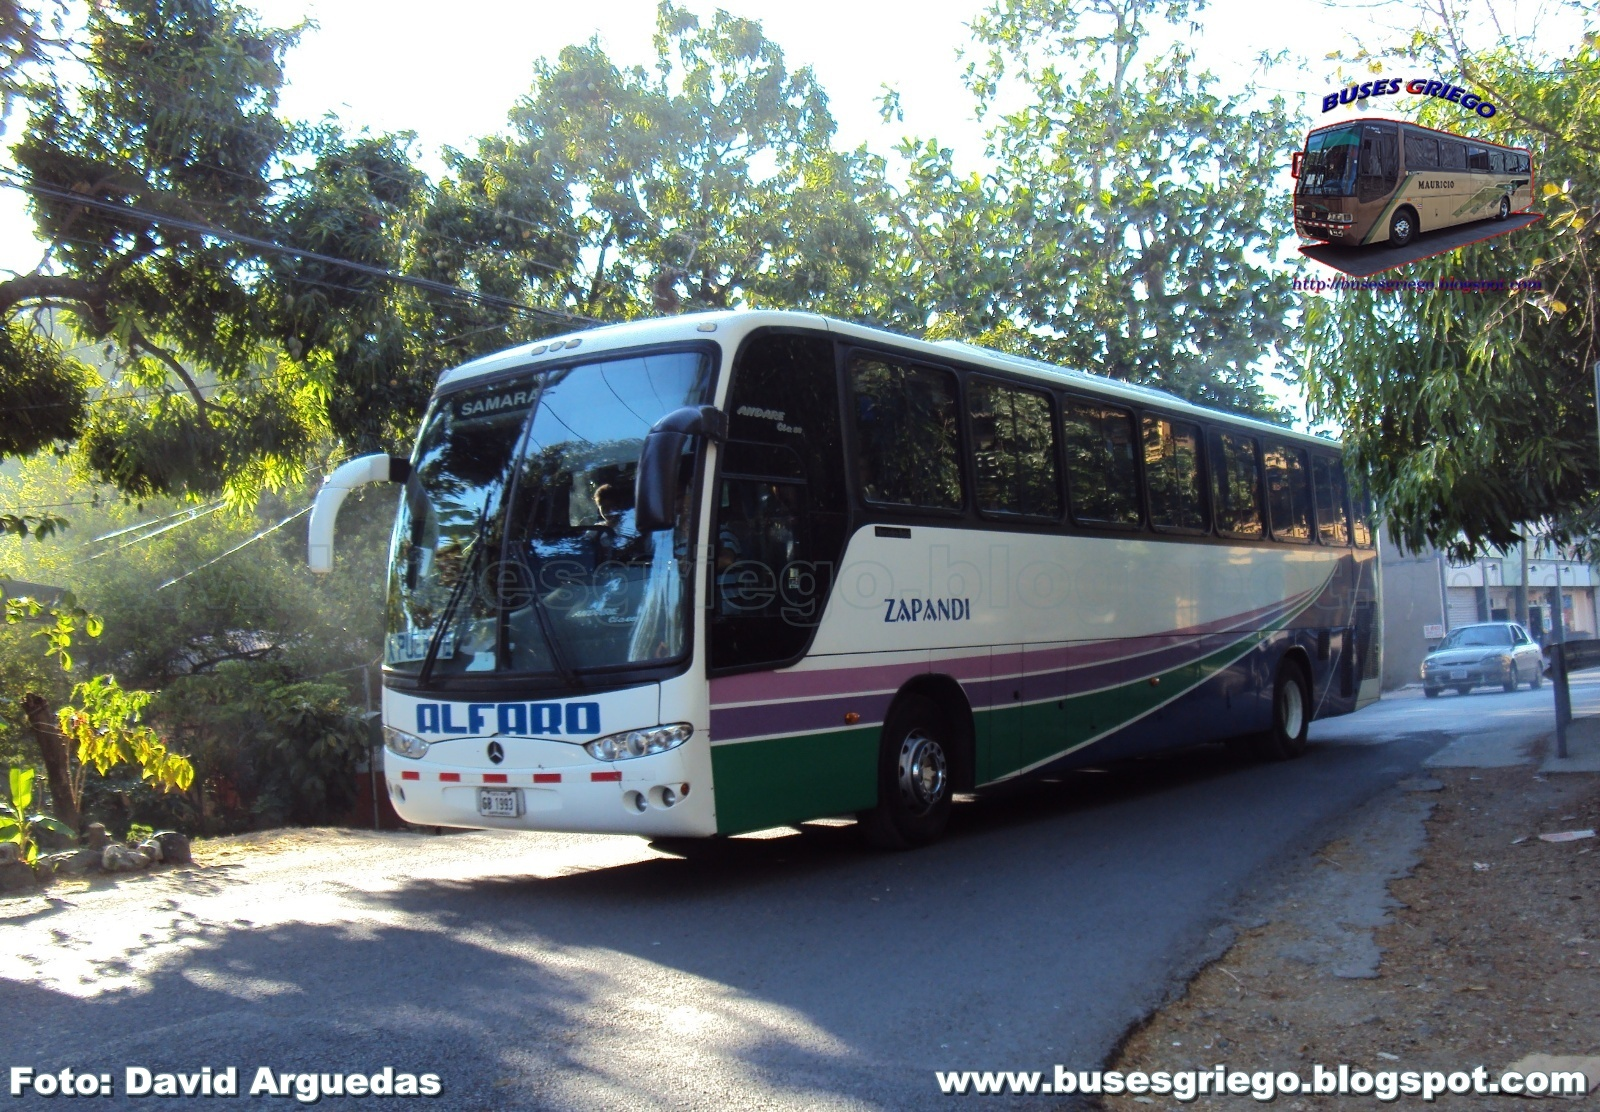 Buses griego galeria 39 12 04 11 for Mercedes benz san jose